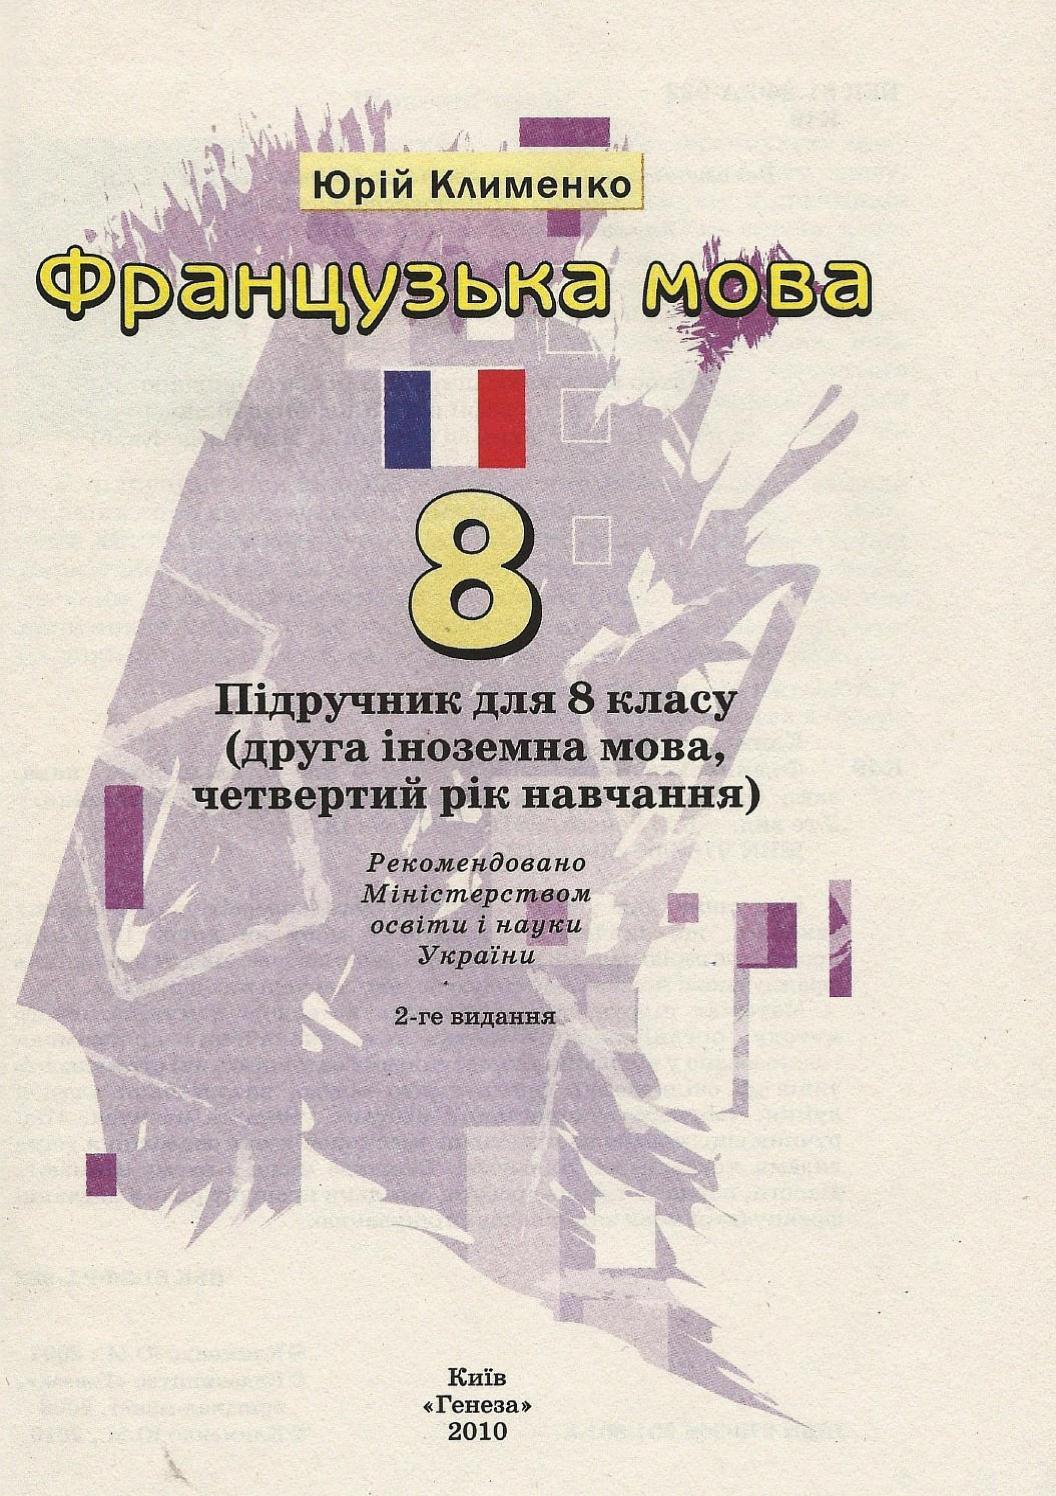 клименко 8 клас гдз